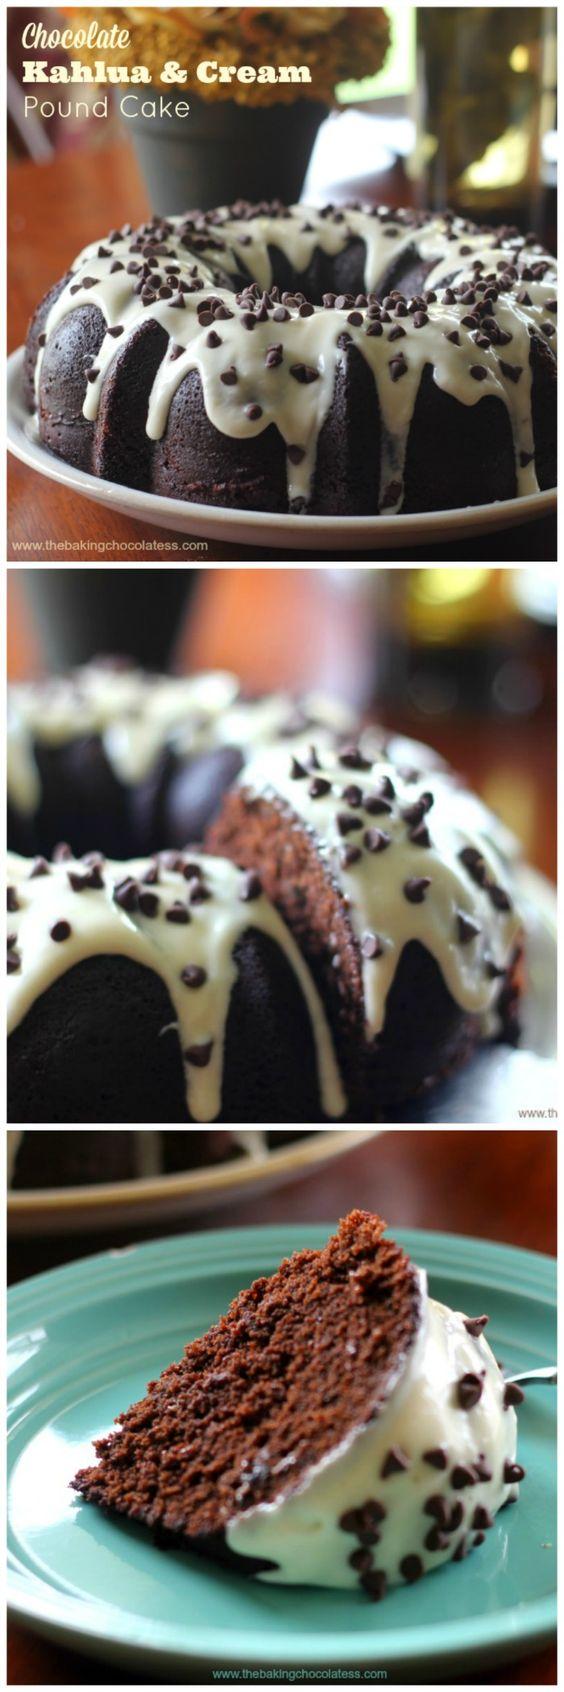 Home-made Chocolate Kahlua & Cream Bundt Cake – The Baking ChocolaTess #TriplePFeature